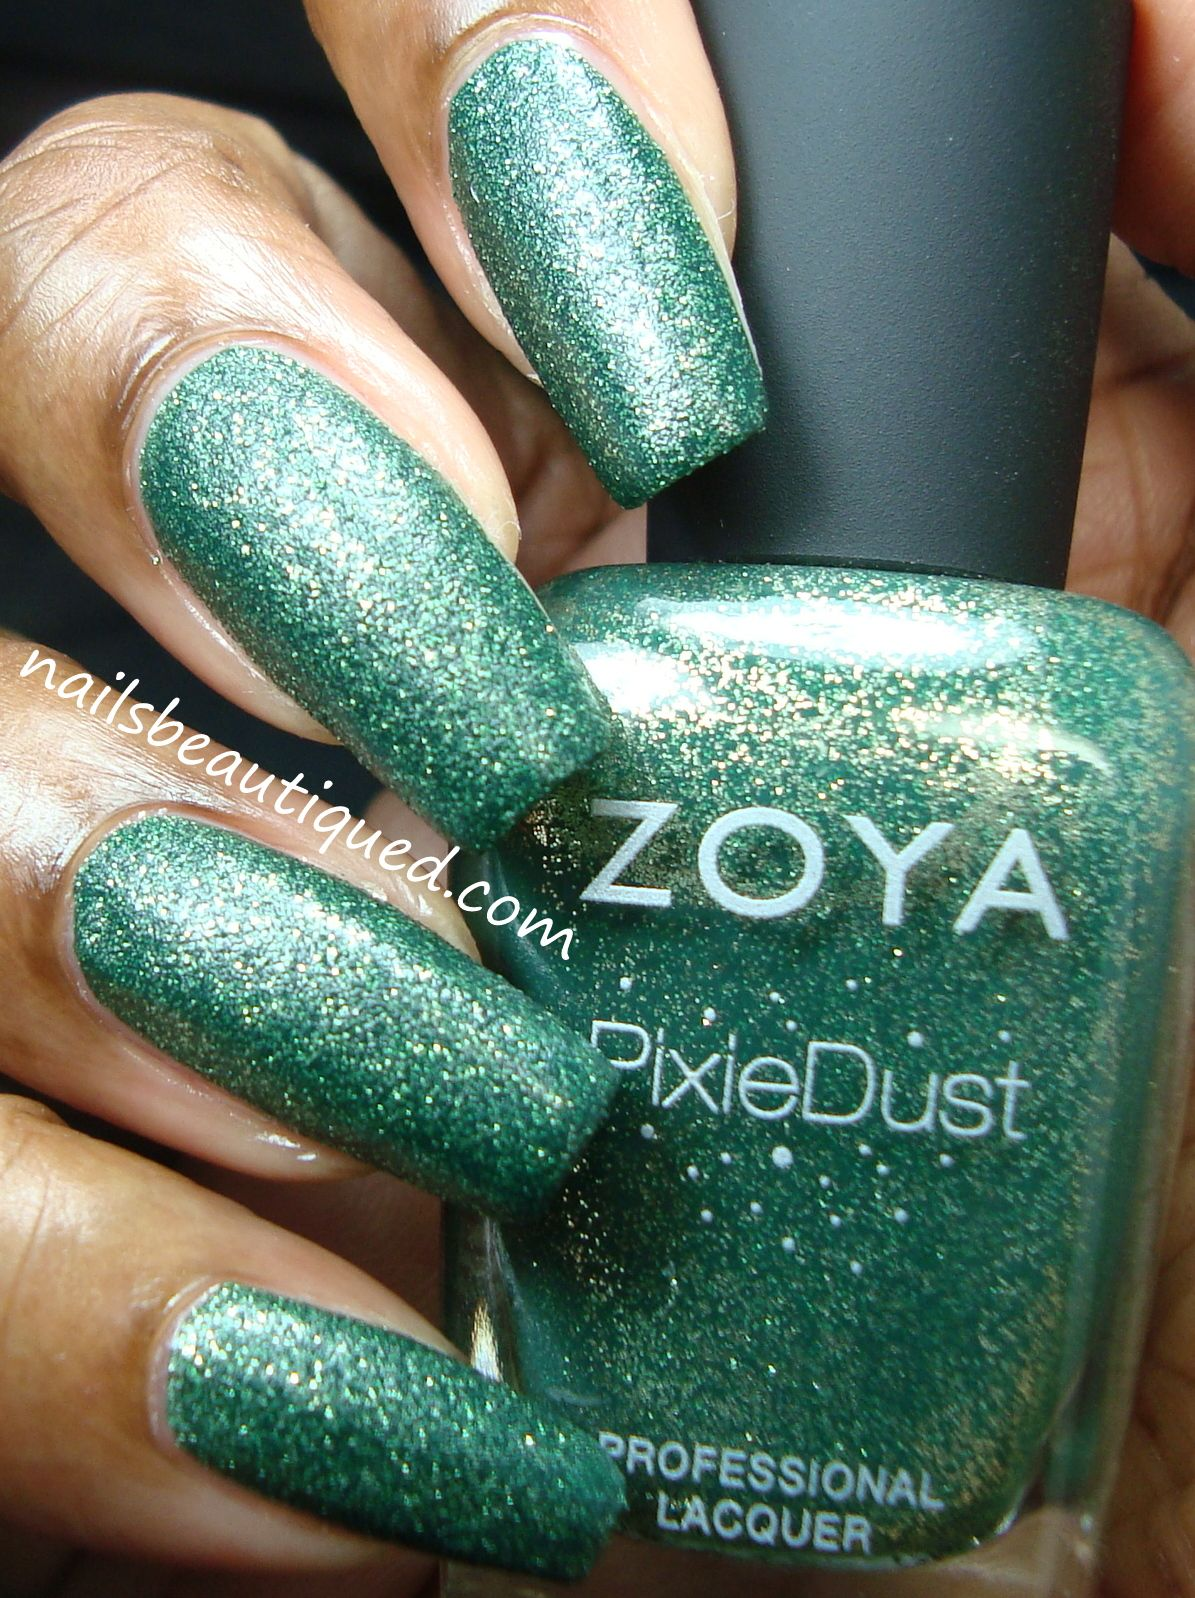 Longer Nails in Green: Zoya Pixie Dust 2013 Fall Edition, Chita ...